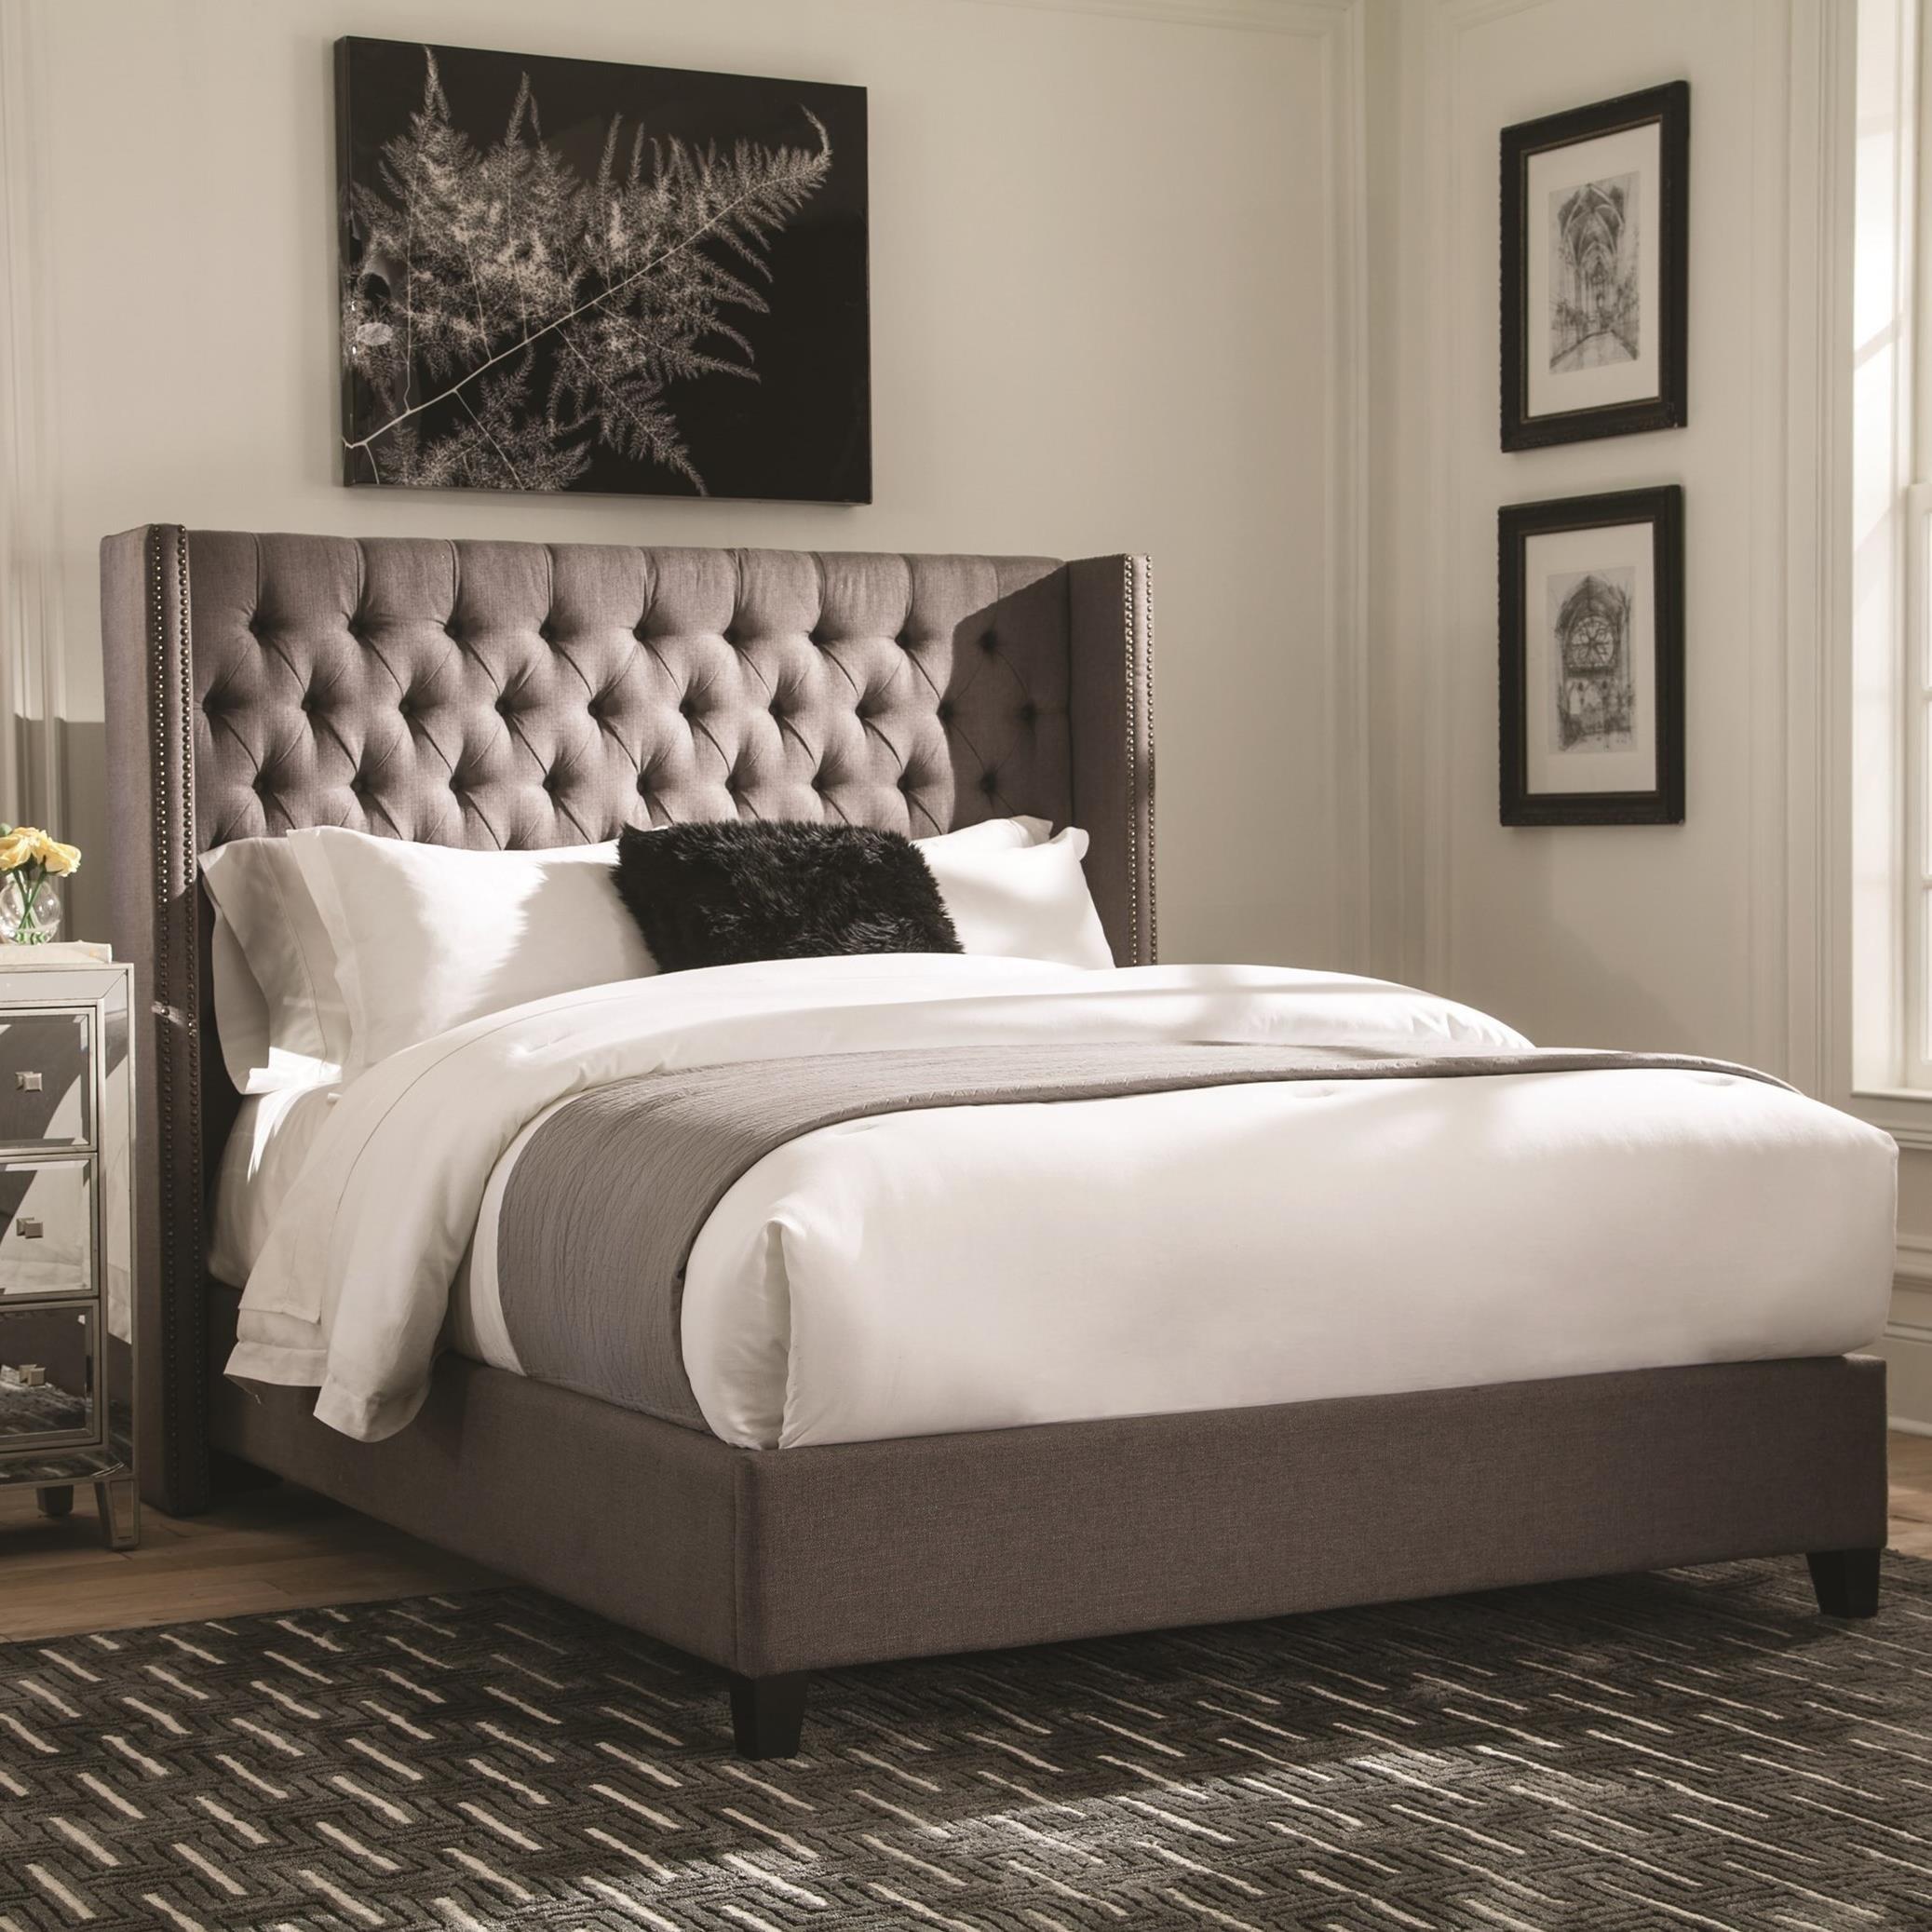 Scott Living Benicia Full Bed - Item Number: 300705F